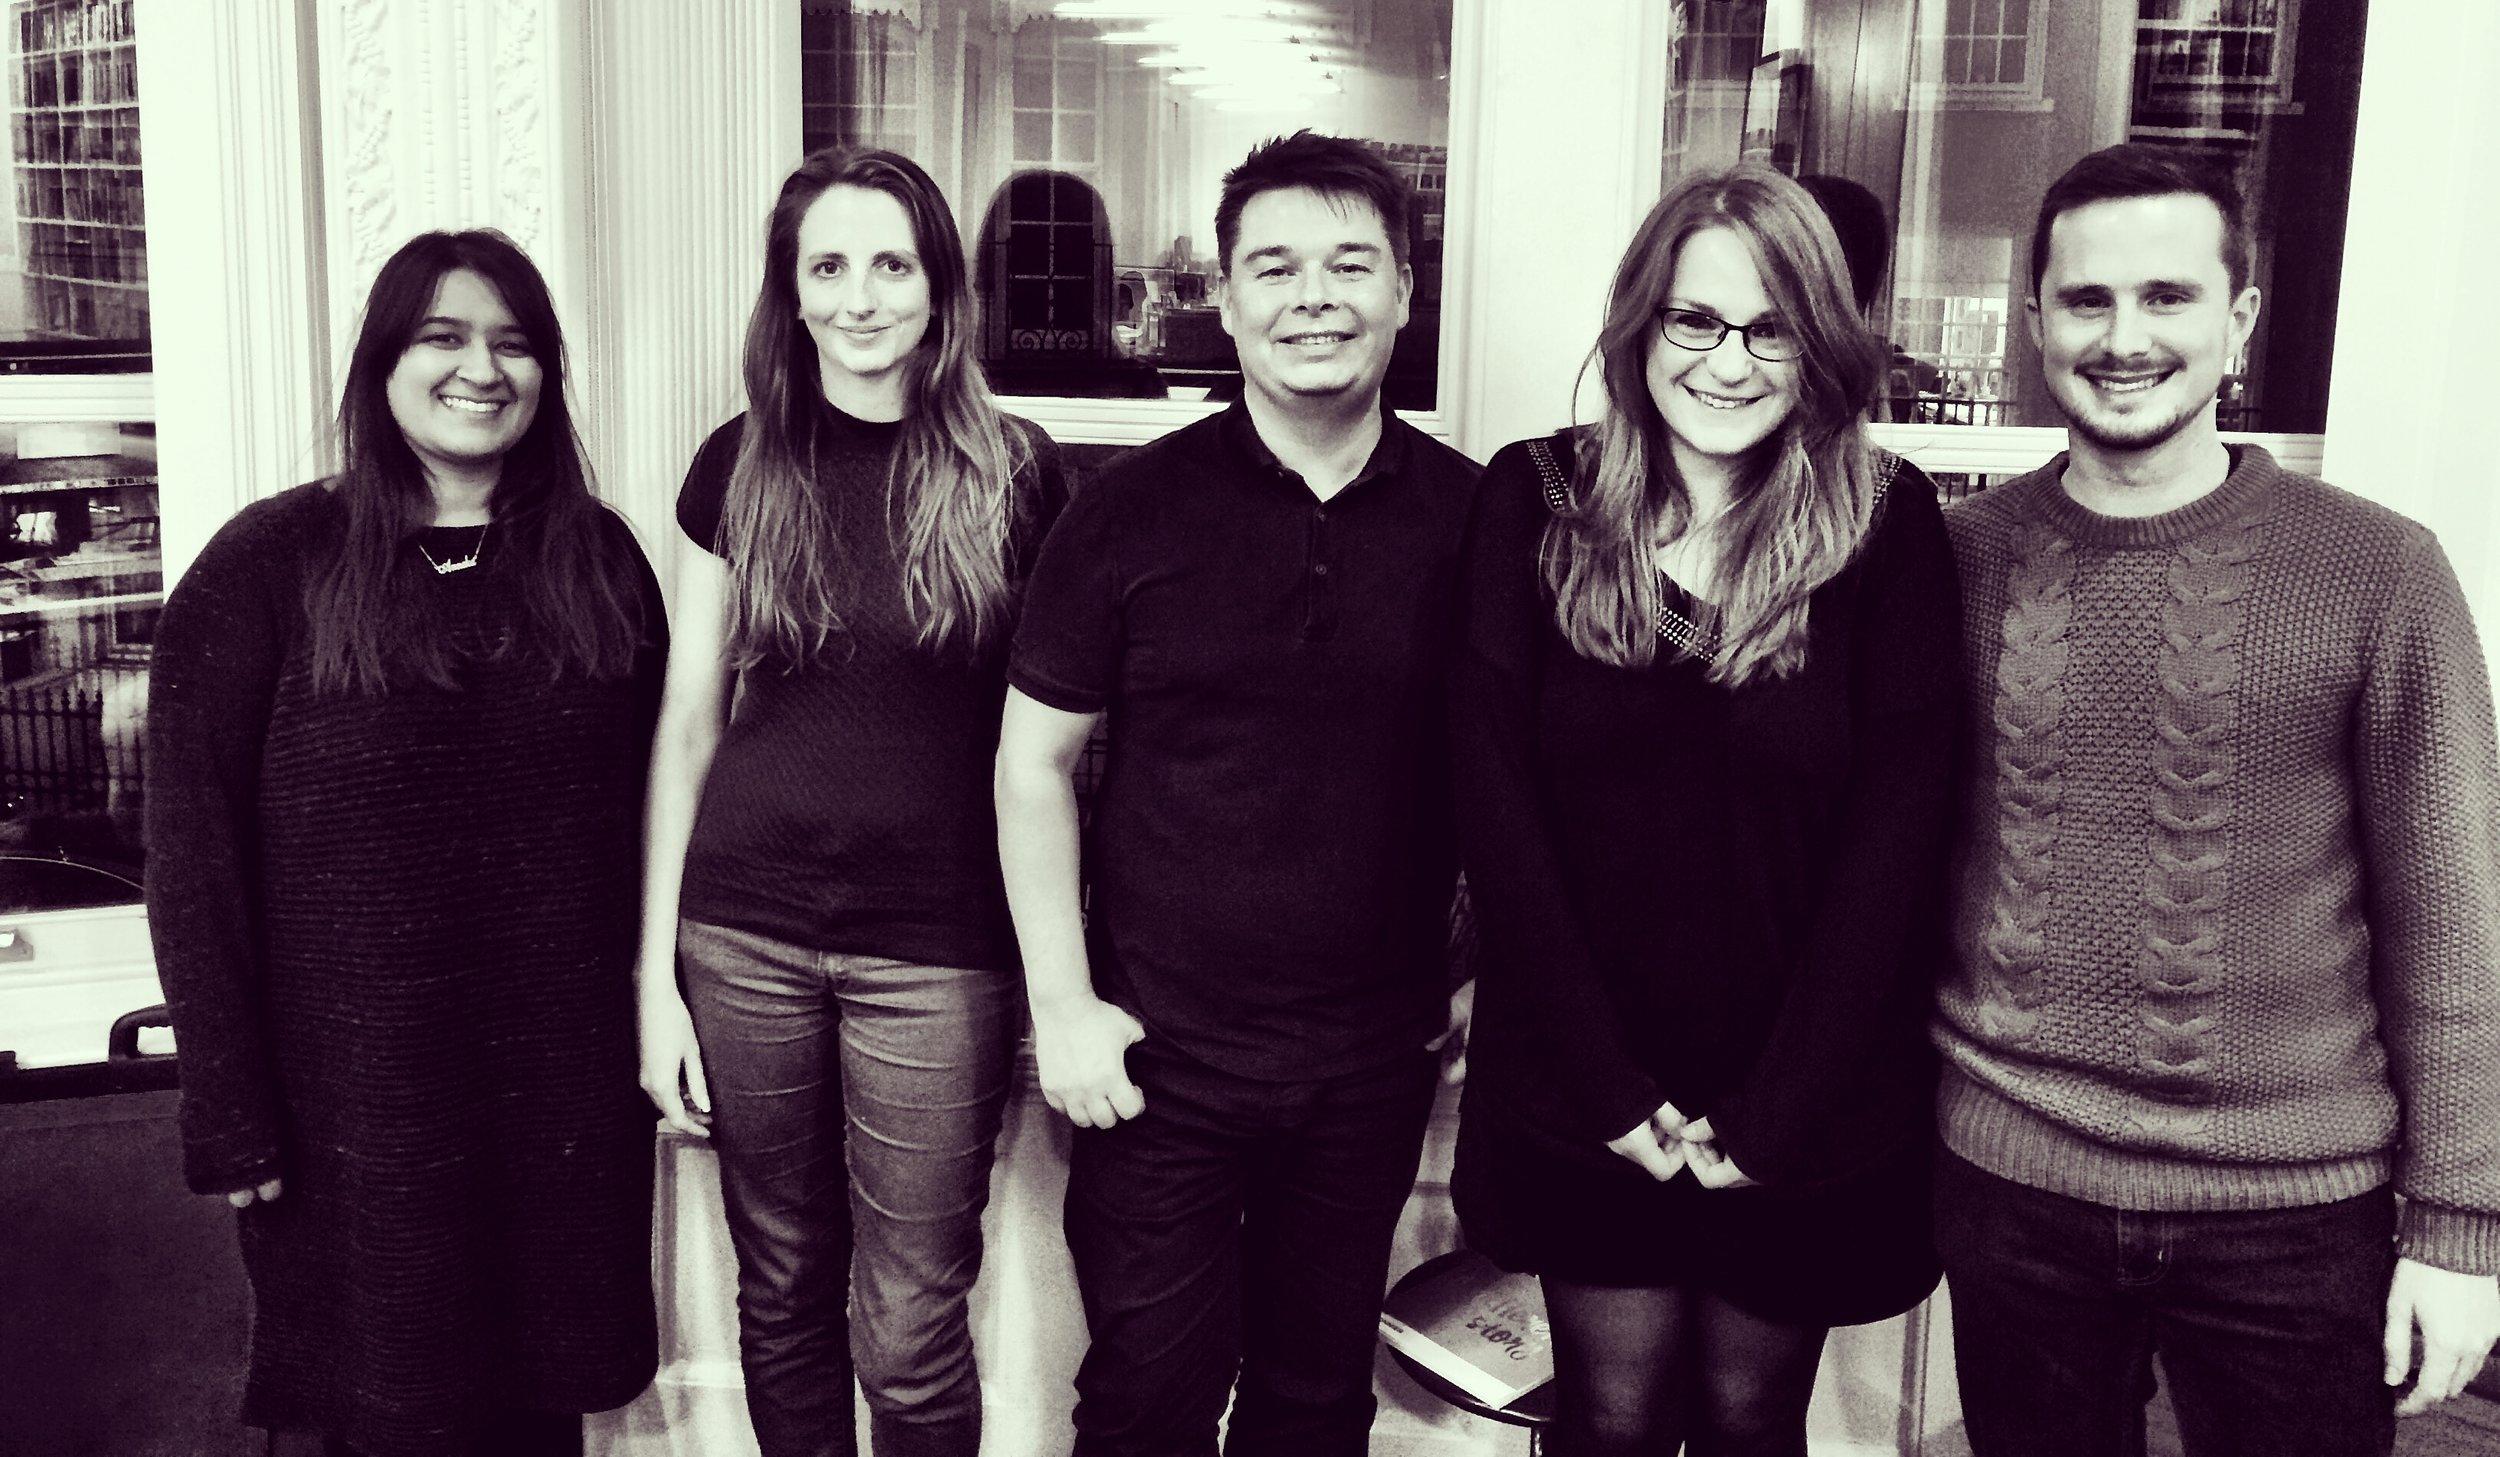 From left to right: Anneka Sandher, Cherie Chapman, Nick Stearn, Alexandra Allden, Lewis Csizmazia